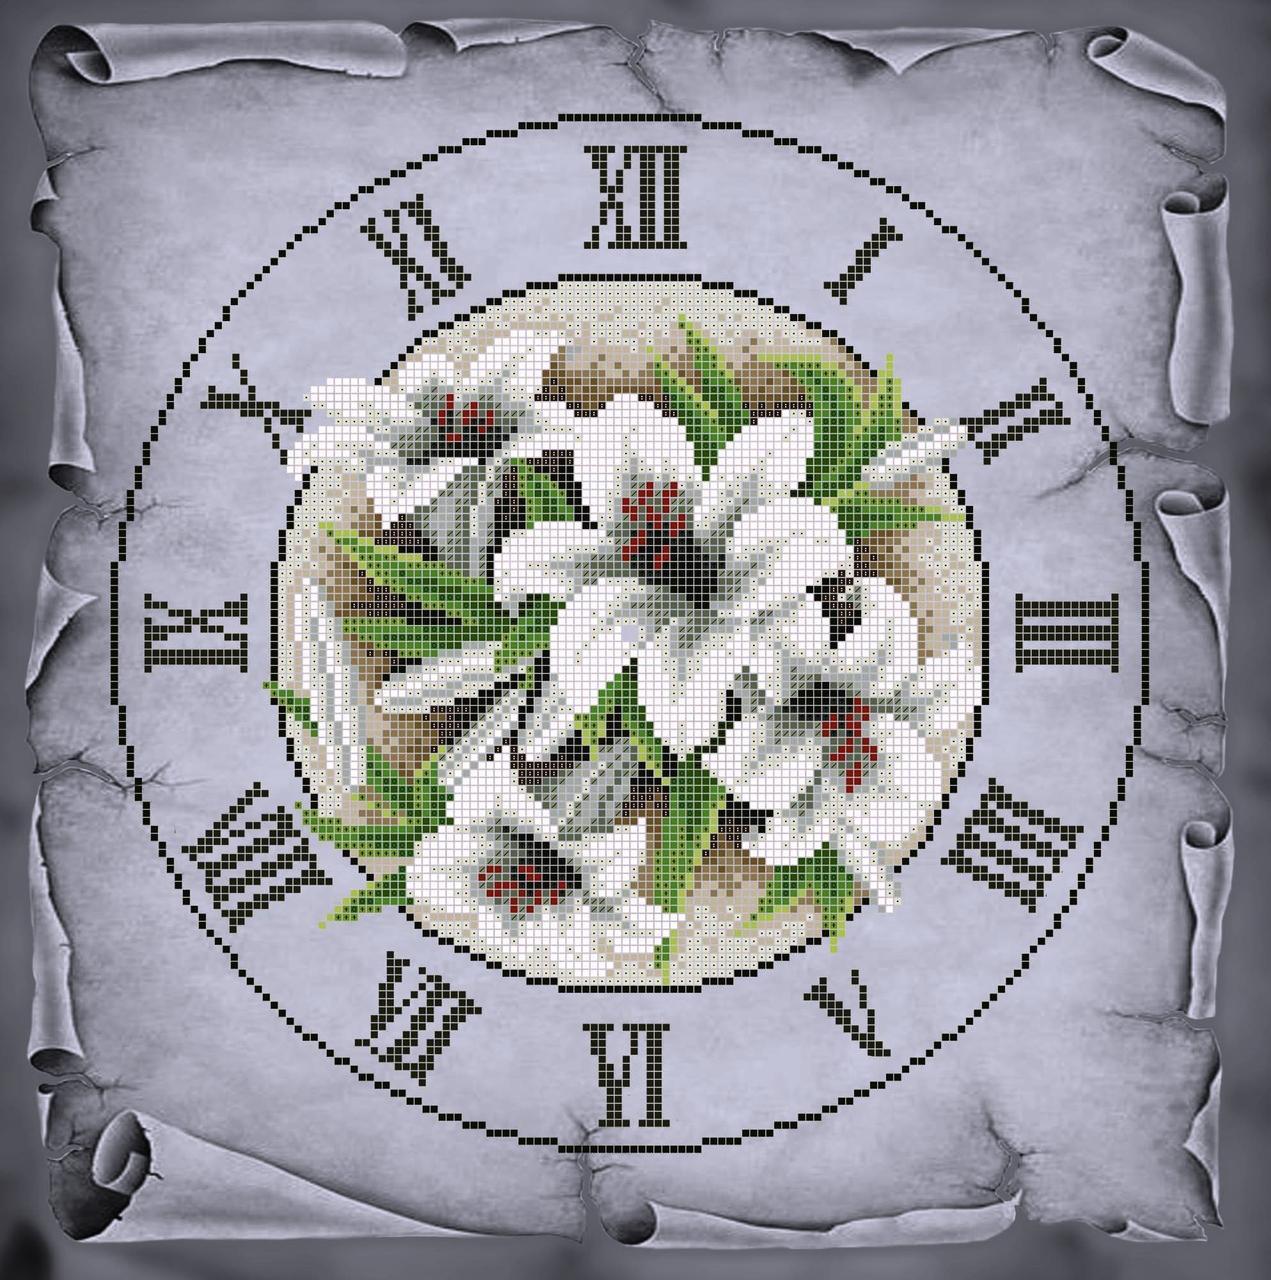 Схема для вышивки / вышивания бисером «Годинник з ліліями» Сірий фон(40x45)